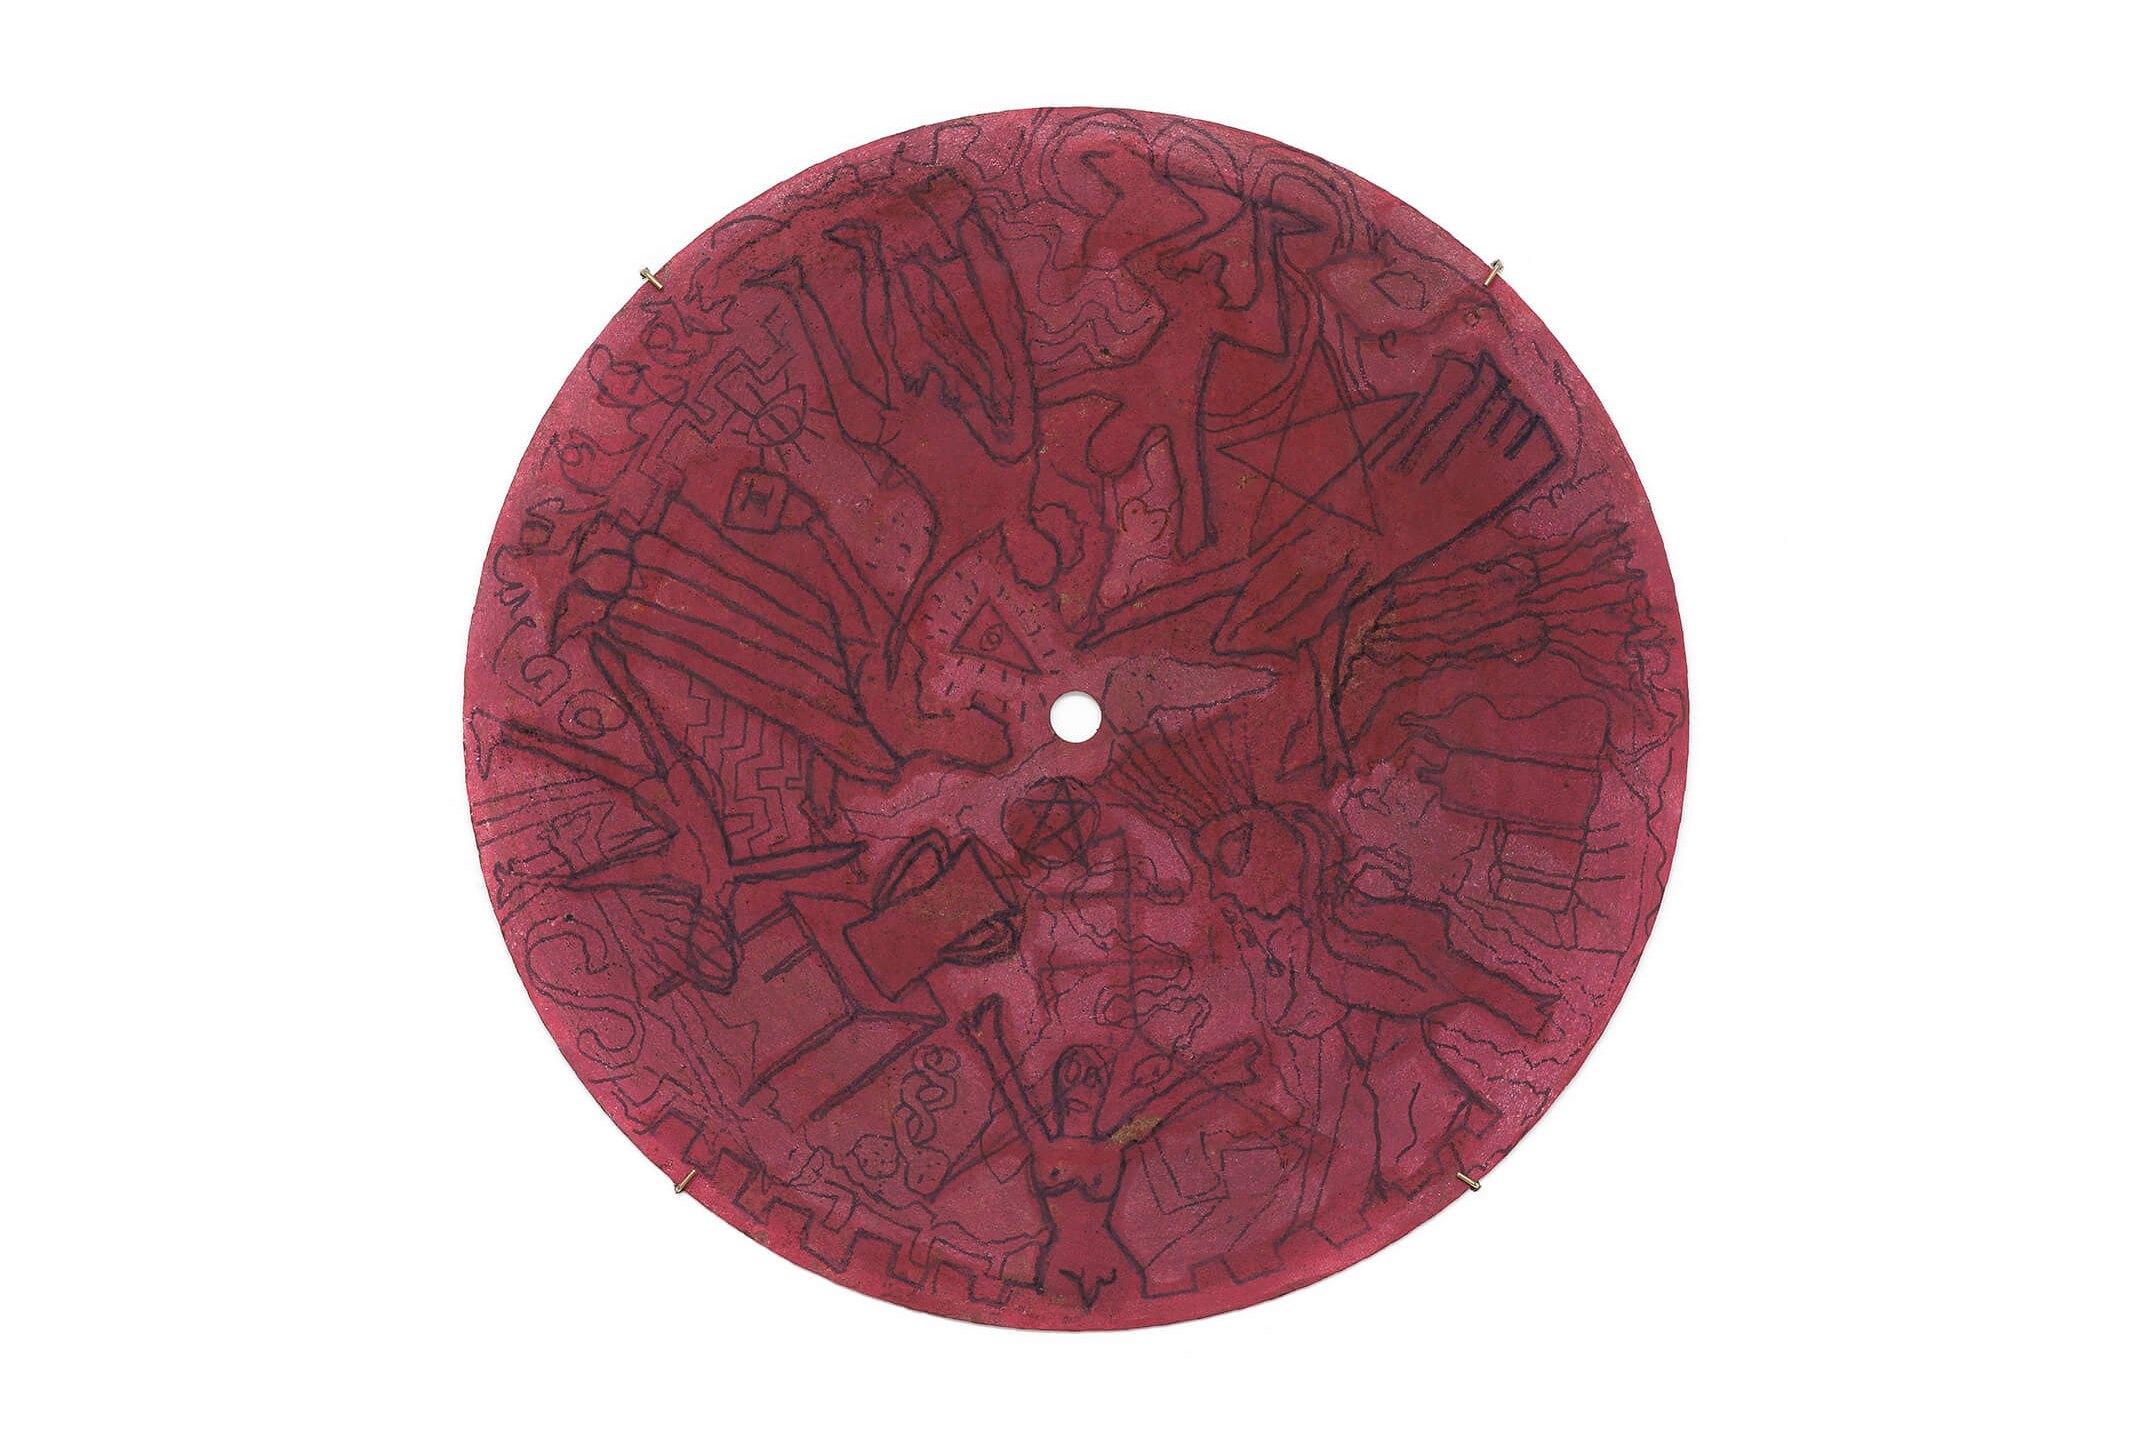 Adriano Costa,<em>The Best Art Fair Ever</em>, 2015, pen and acrylic on brass cap, 61 cm ø - Mendes Wood DM